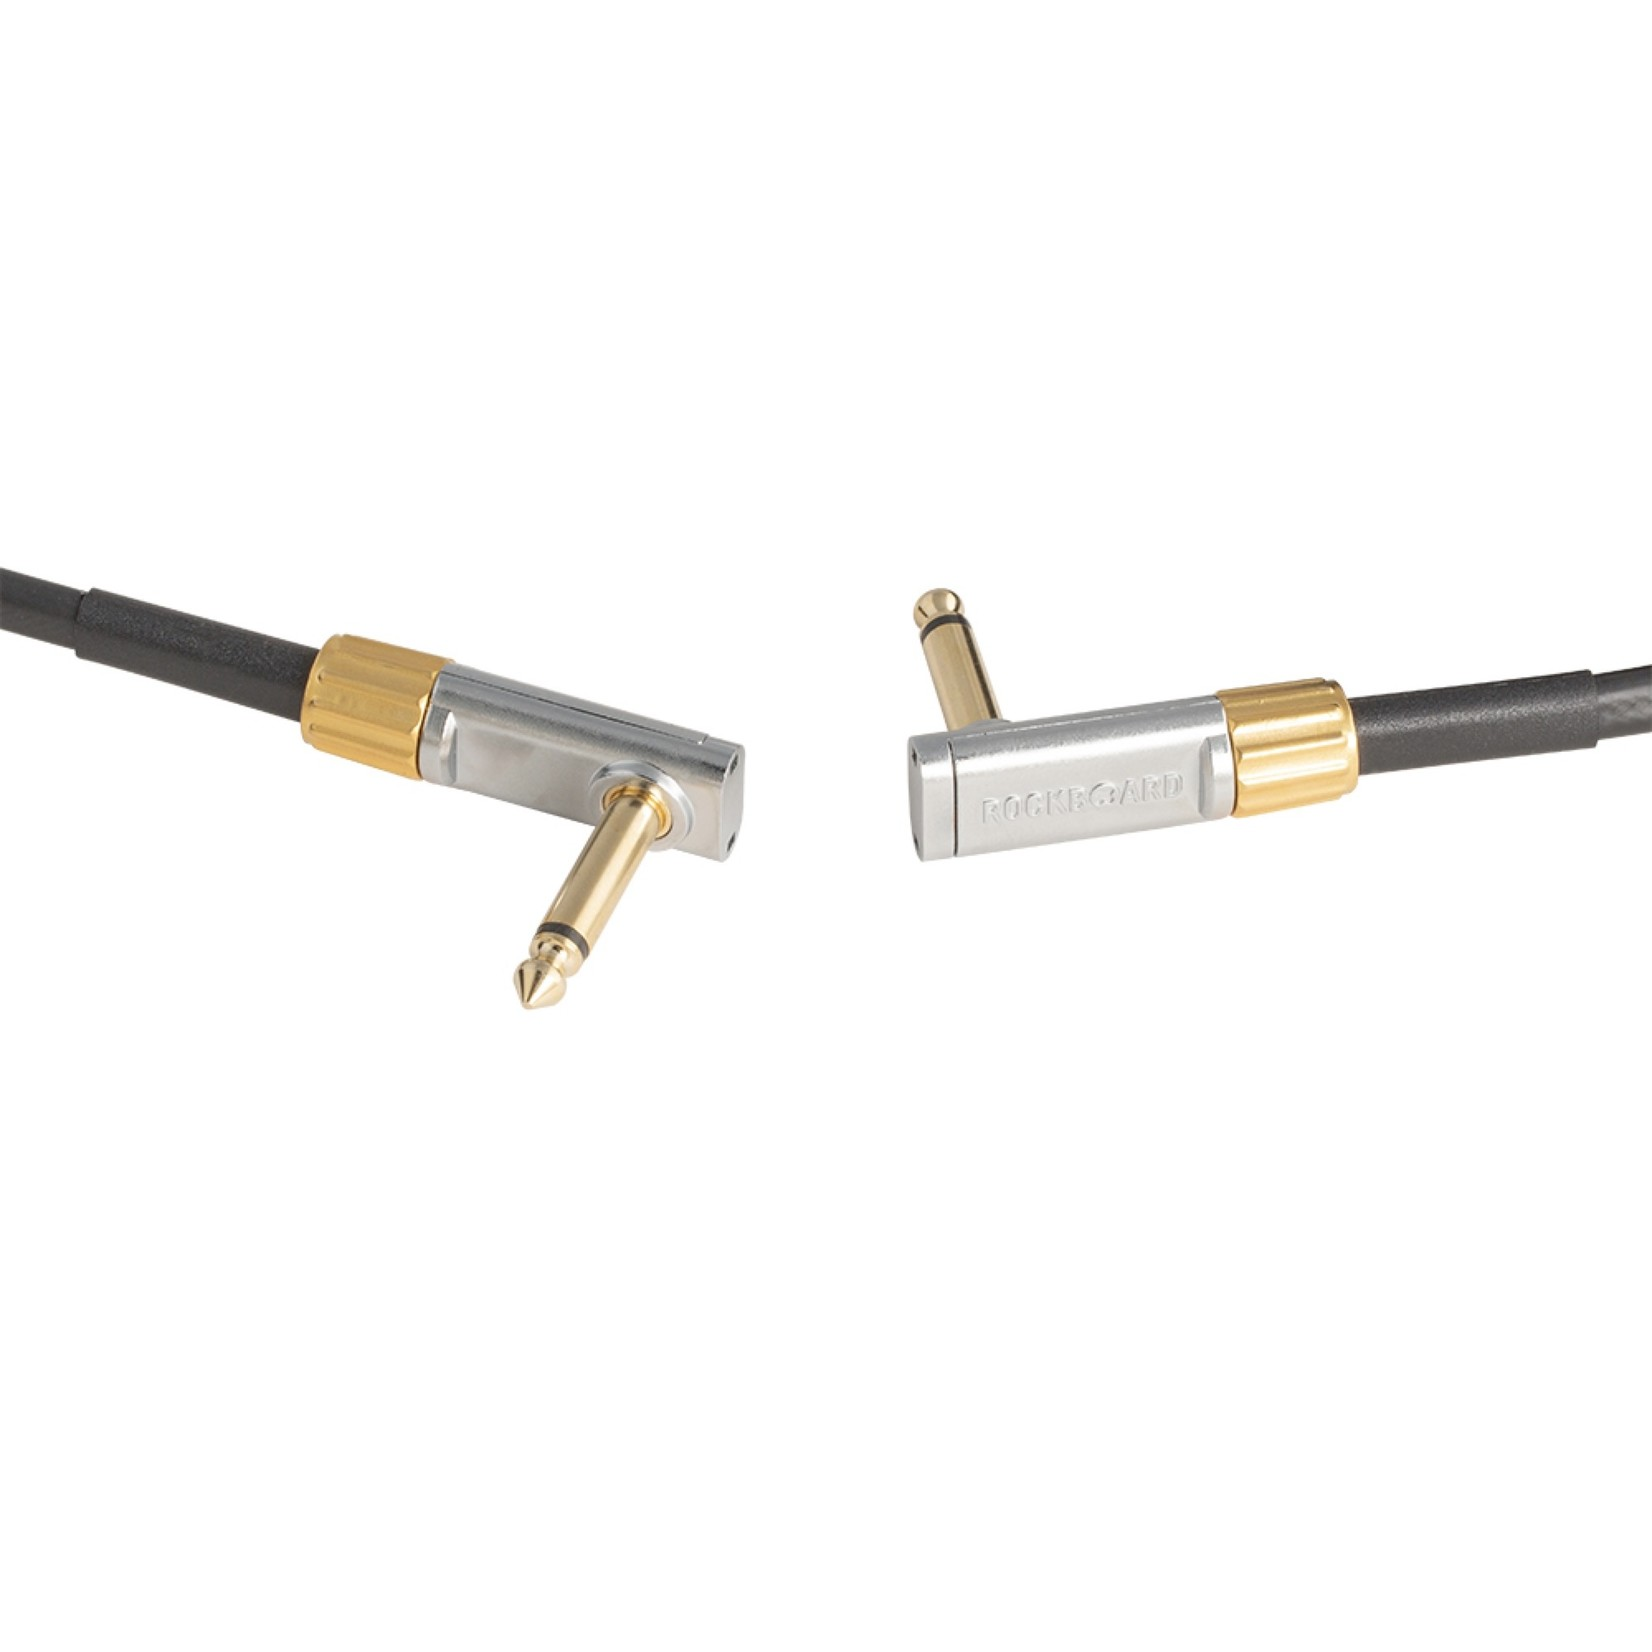 Rockboard RockBoard PREMIUM Flat Instrument Cable, 300 cm / 9.8 ft., angled/angled